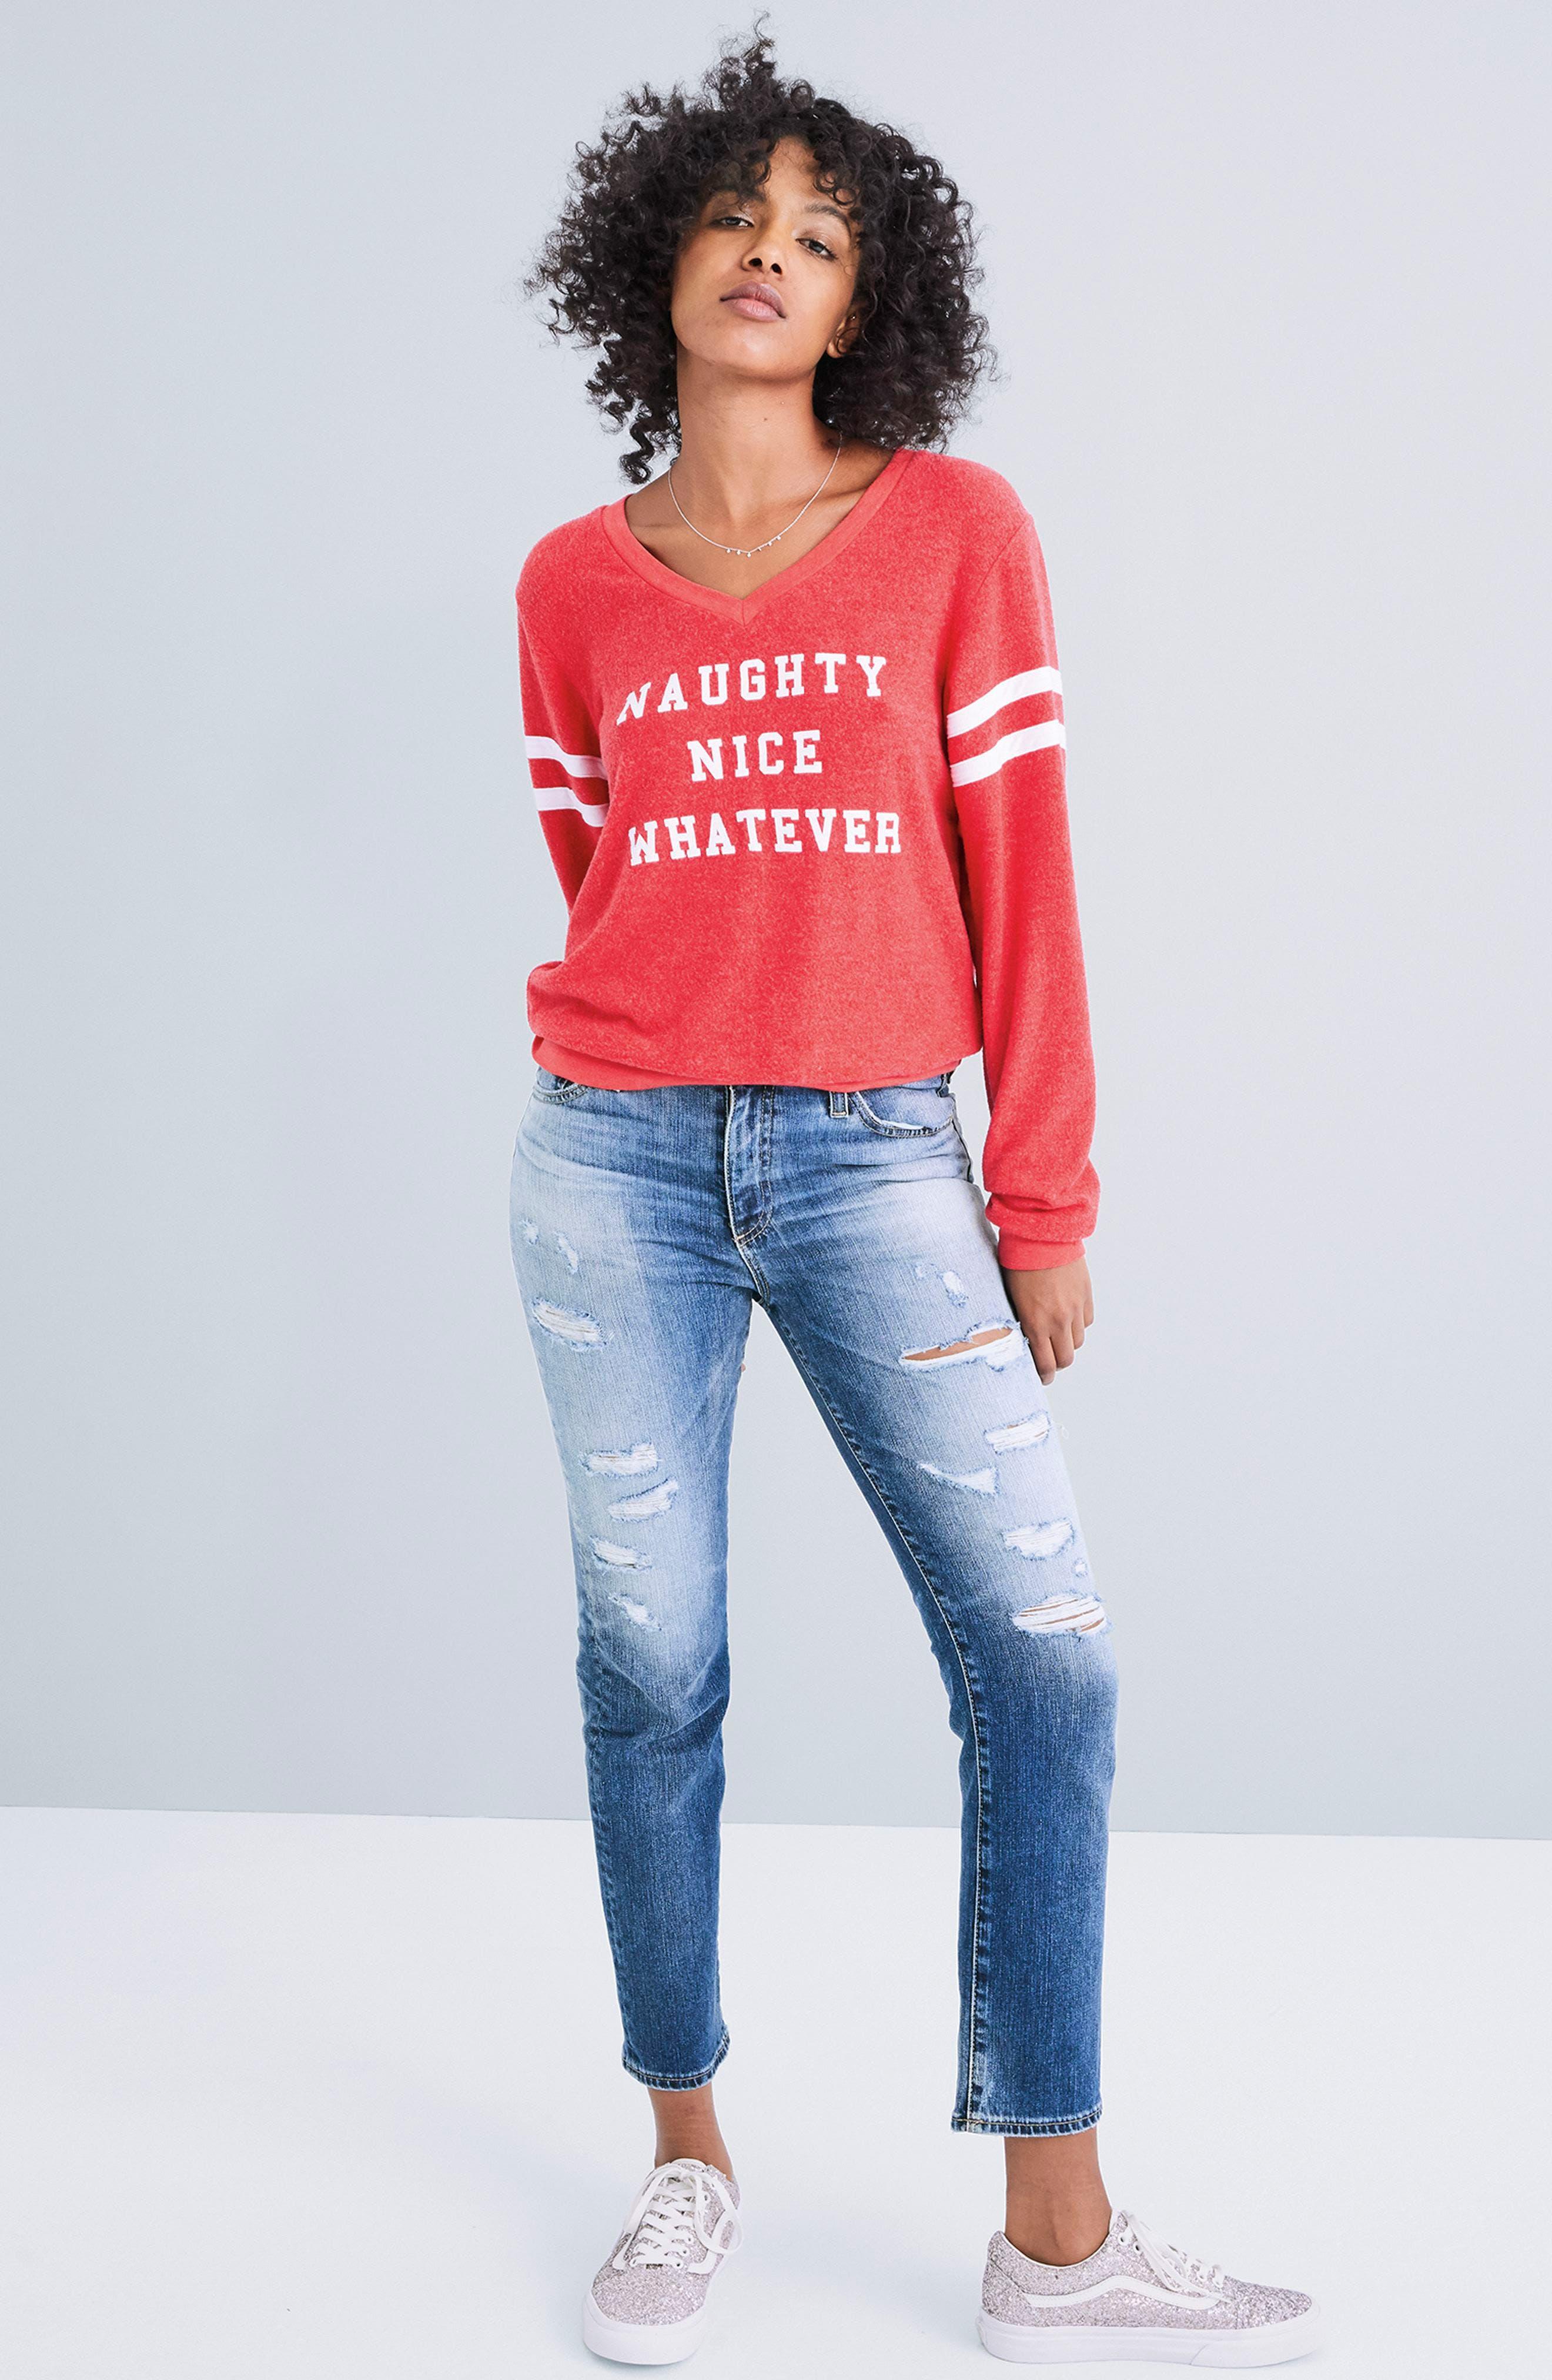 Naughty Nice Whatever Sweatshirt,                         Main,                         color,